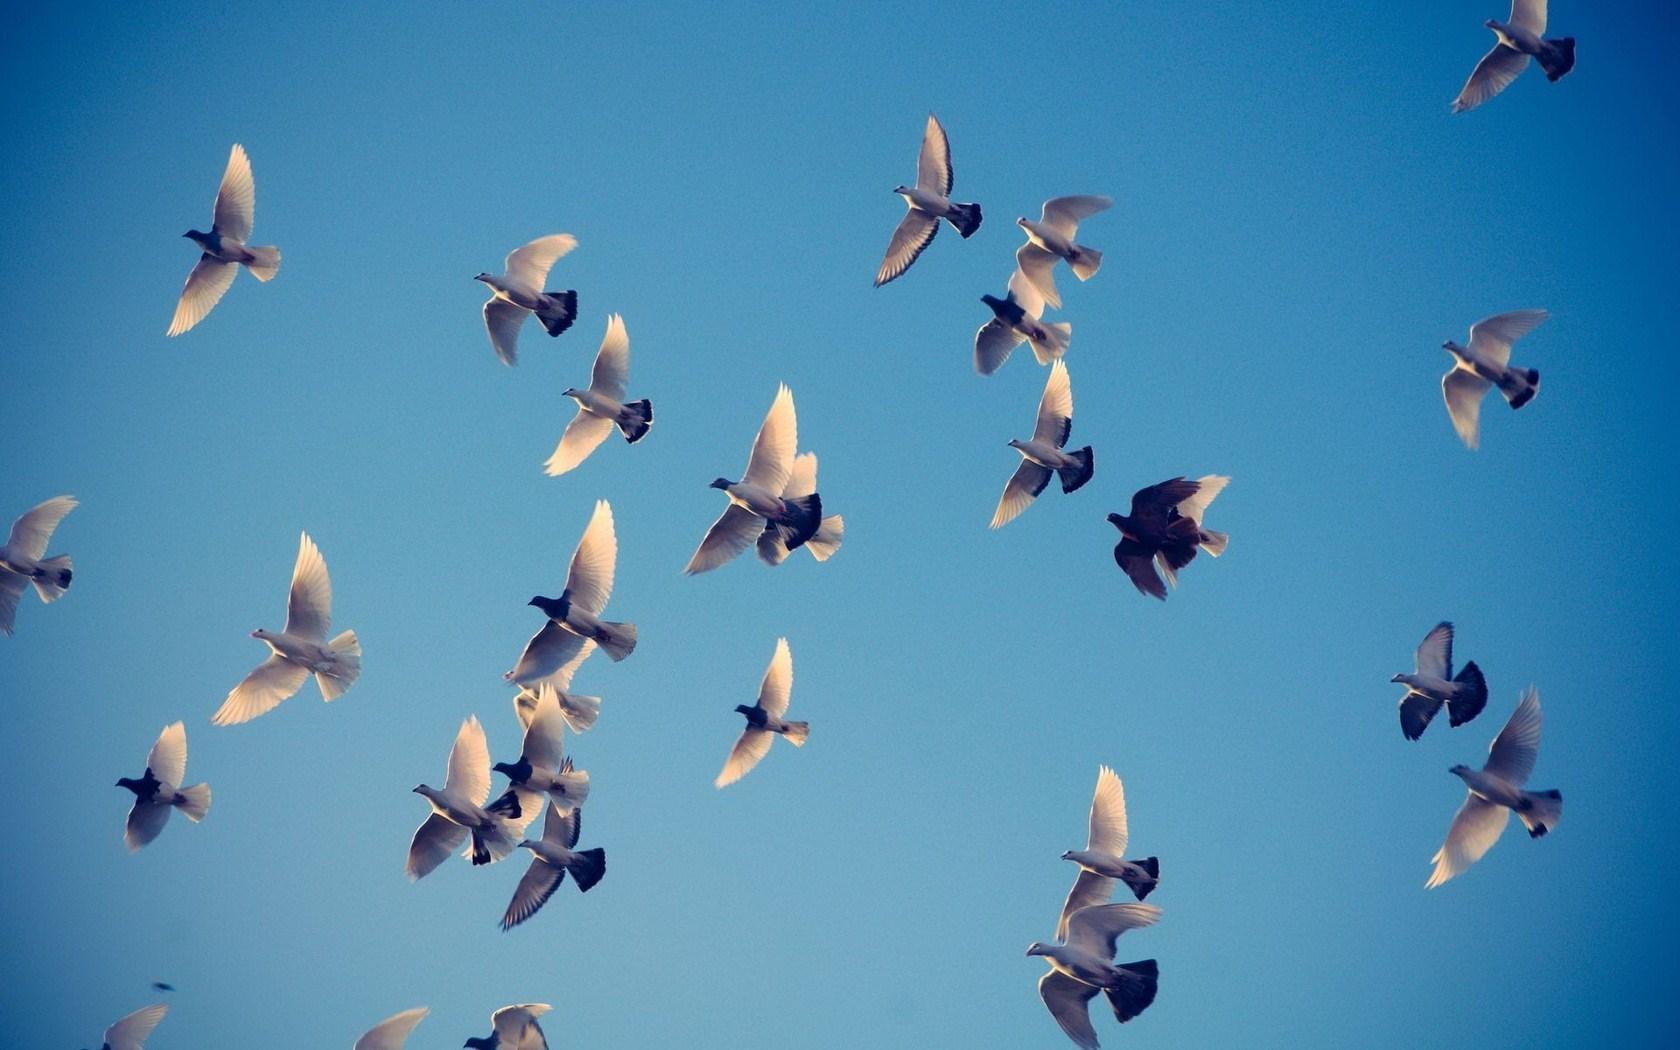 Birds Pigeons Sky Photo HD Wallpaper